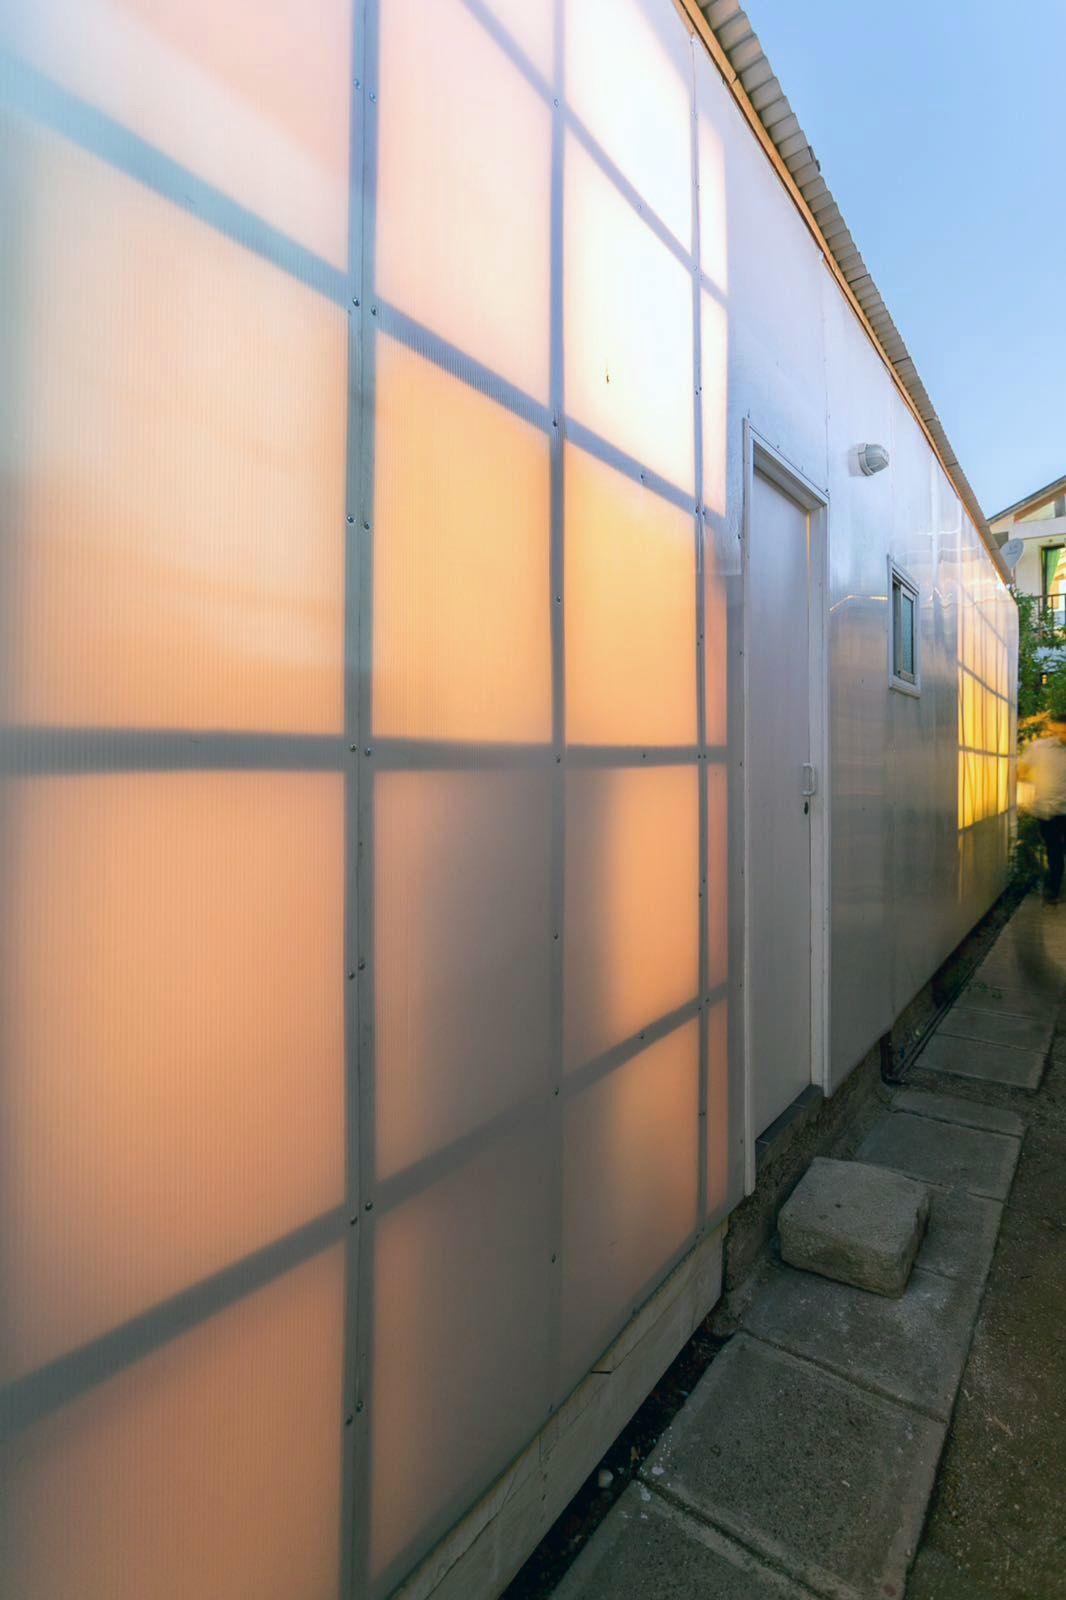 Polycarbonate walls translucent wall exterior structure idea